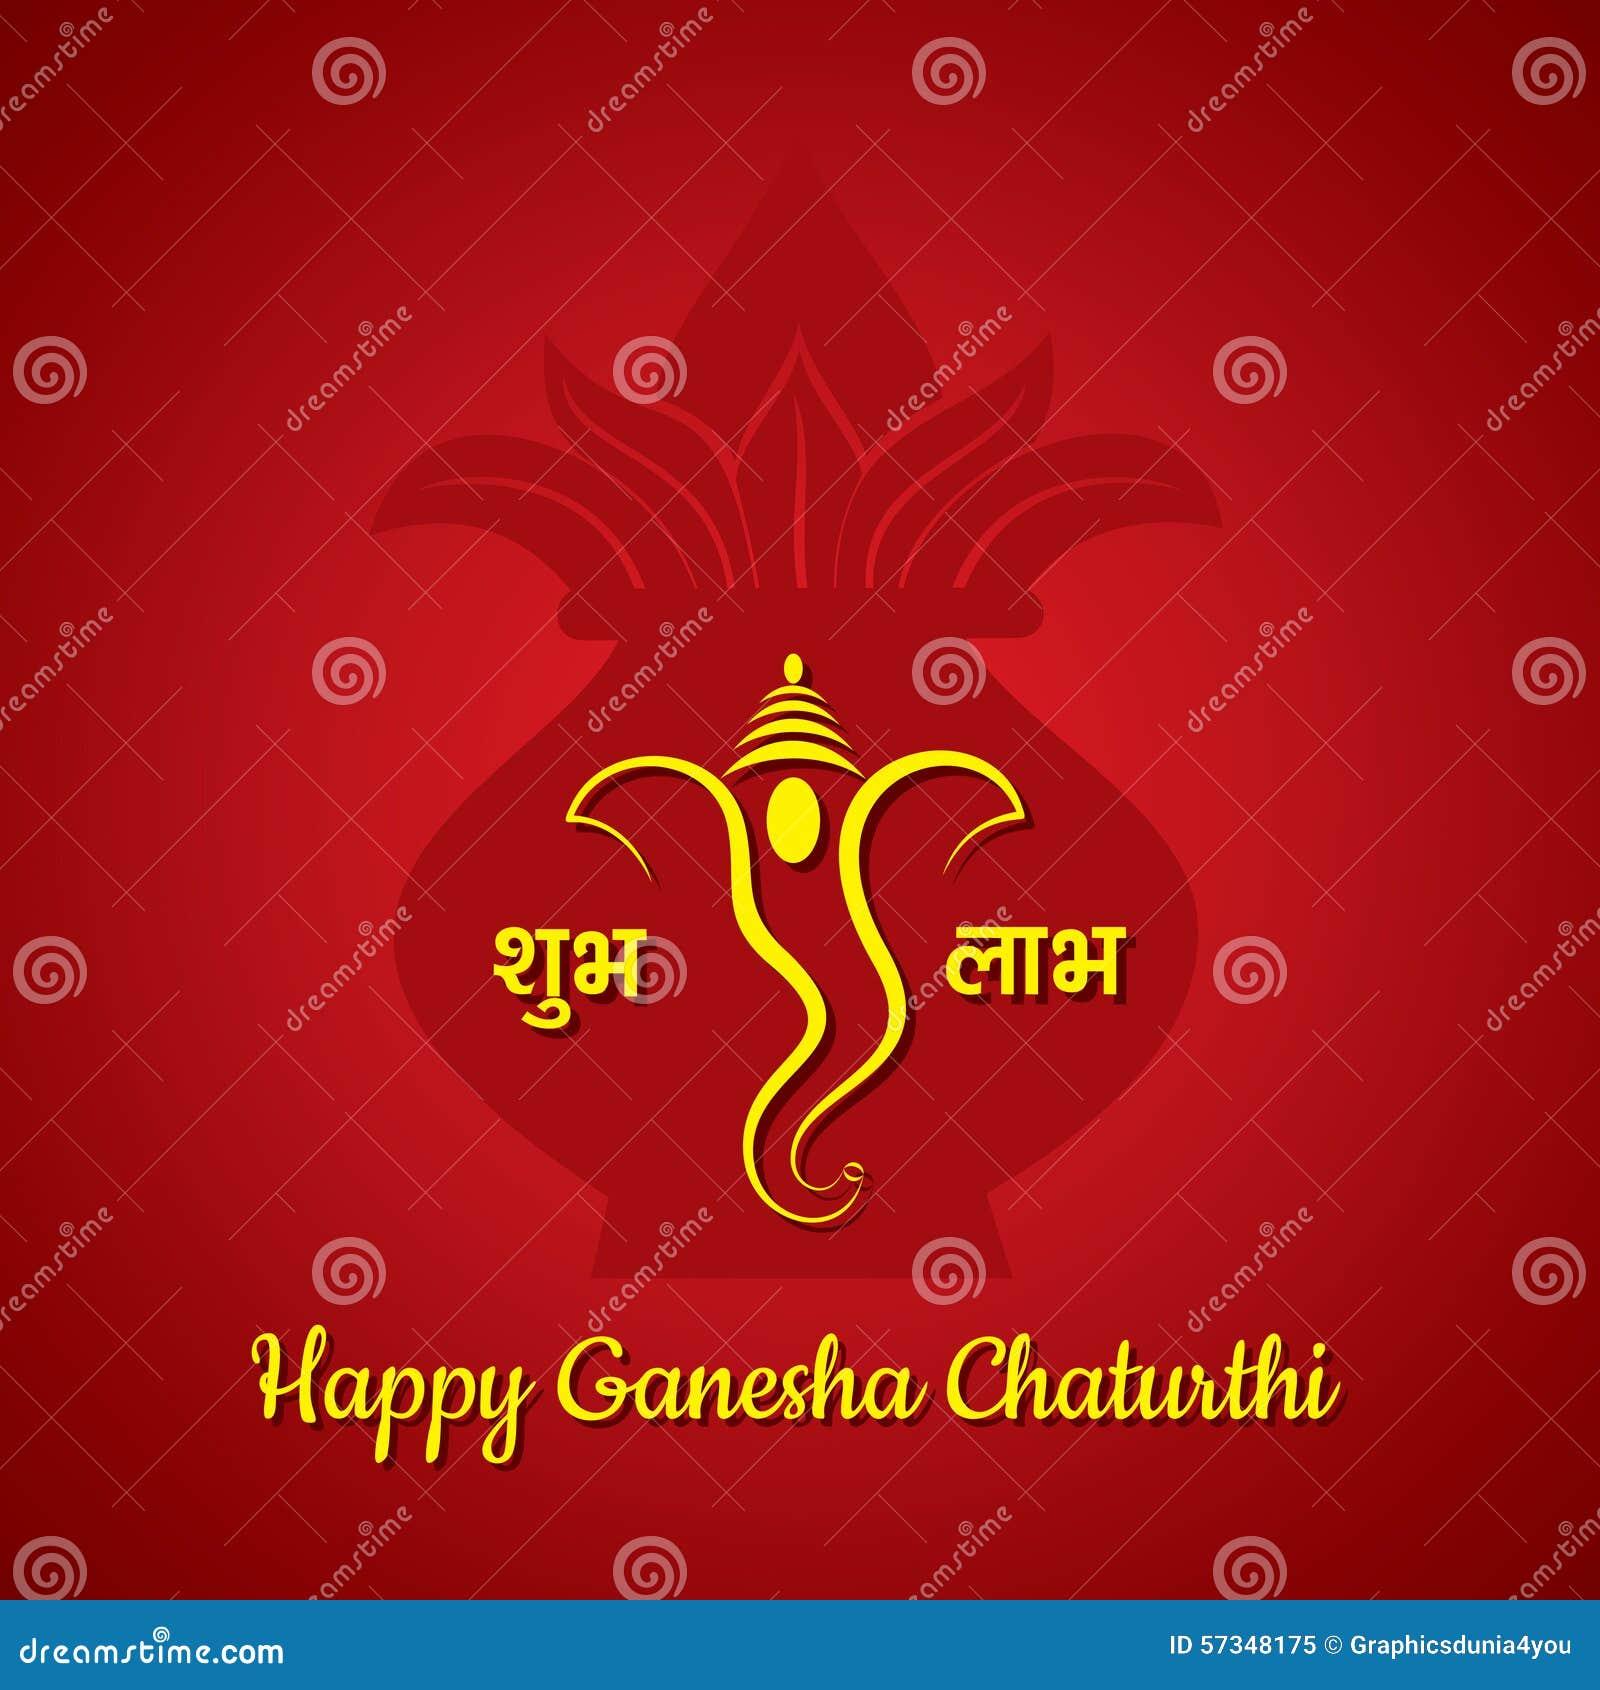 Creative Ganesh Chaturthi Festival Greeting Card Background Stock